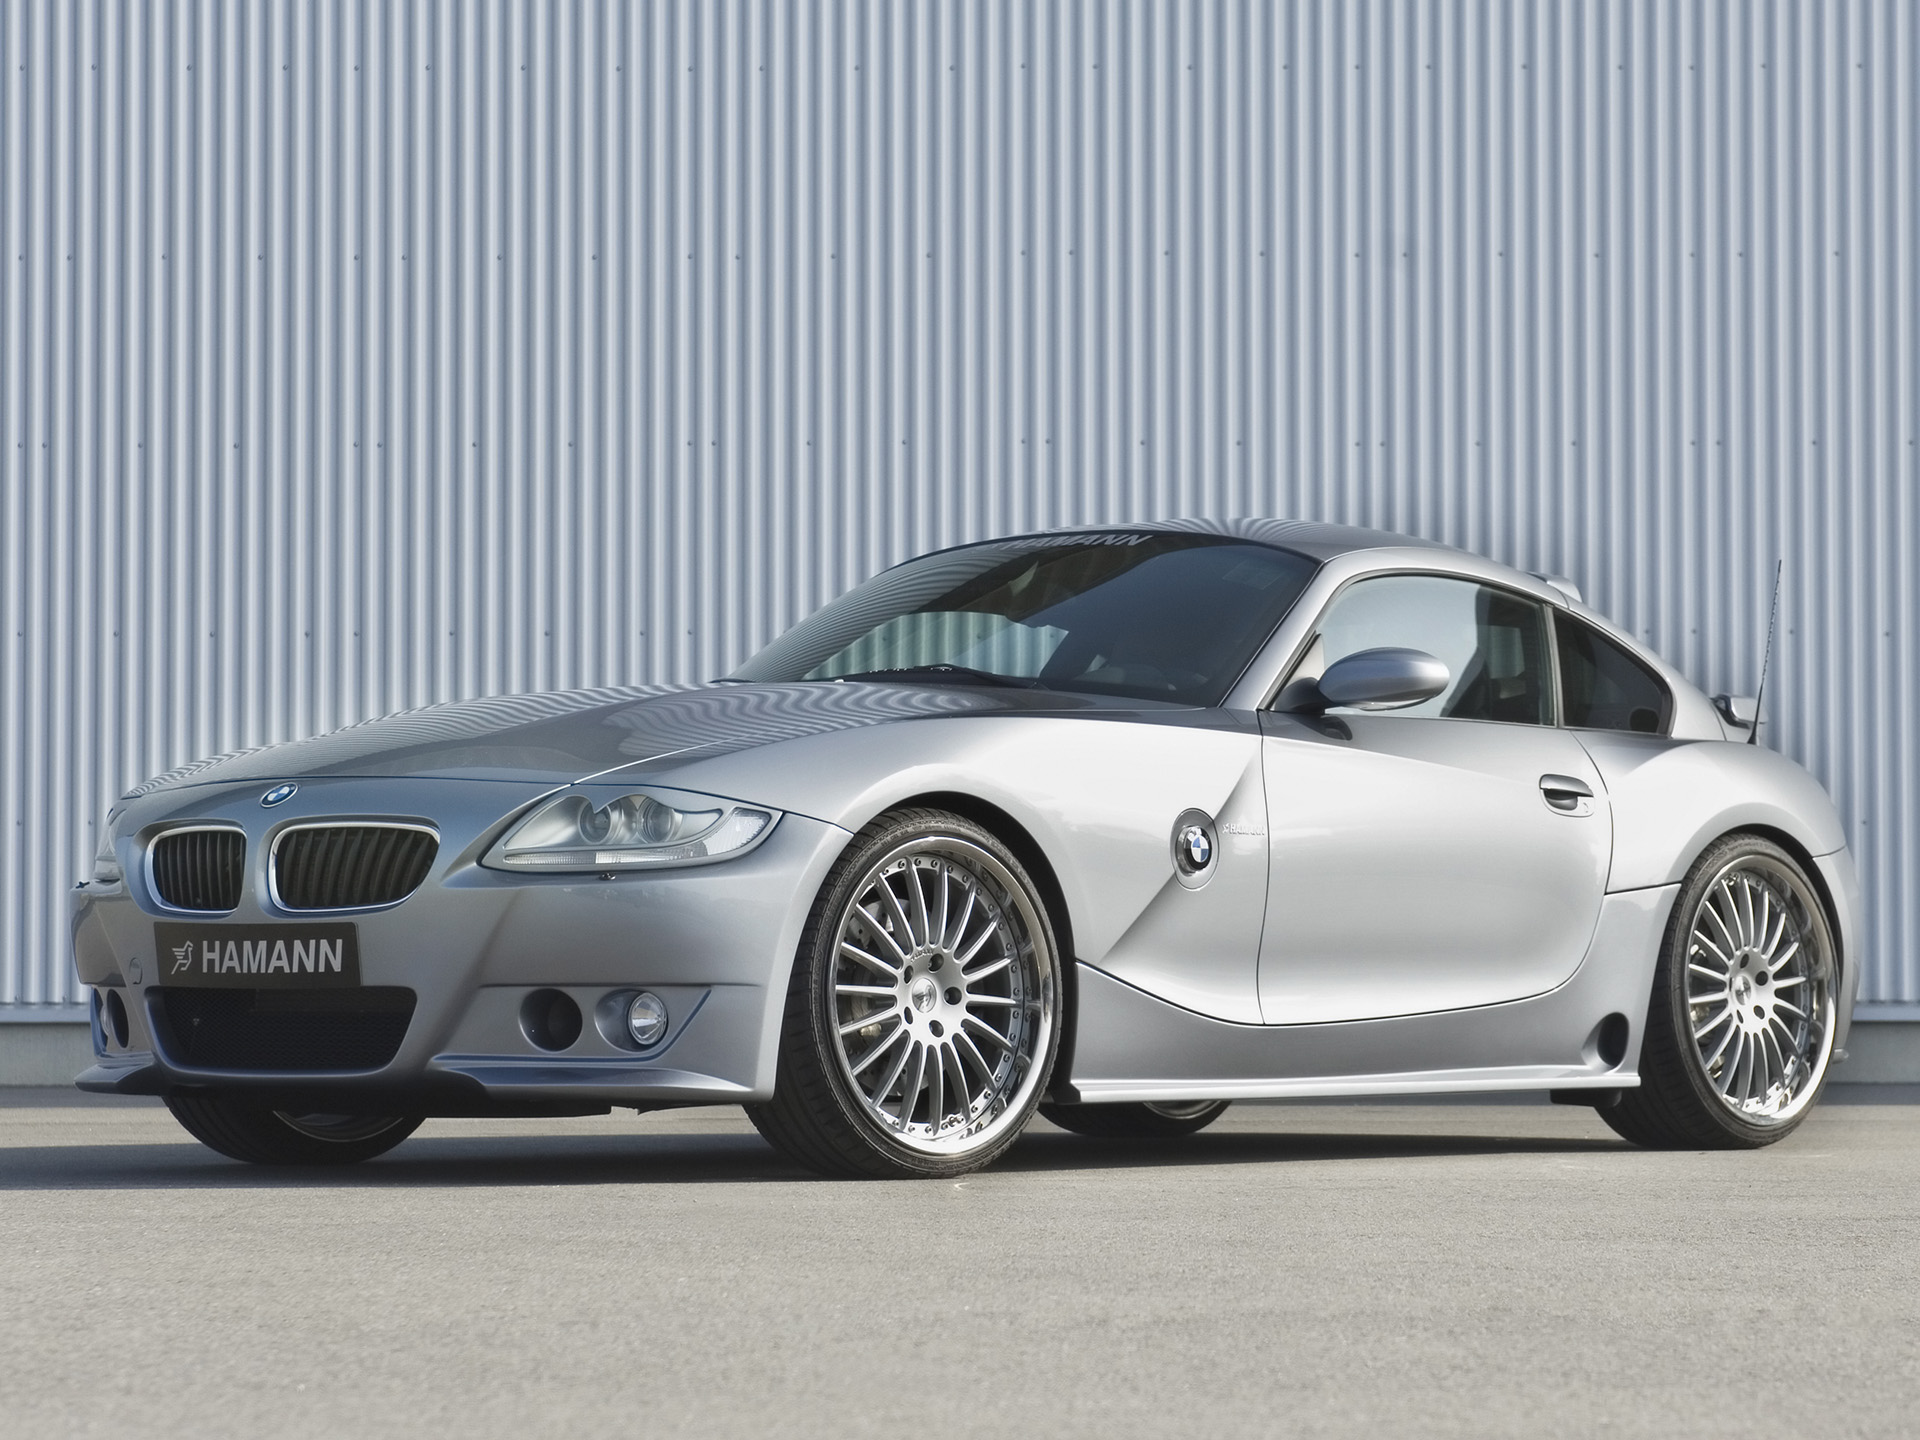 Hamann BMW Z4 M Coupe photo #1